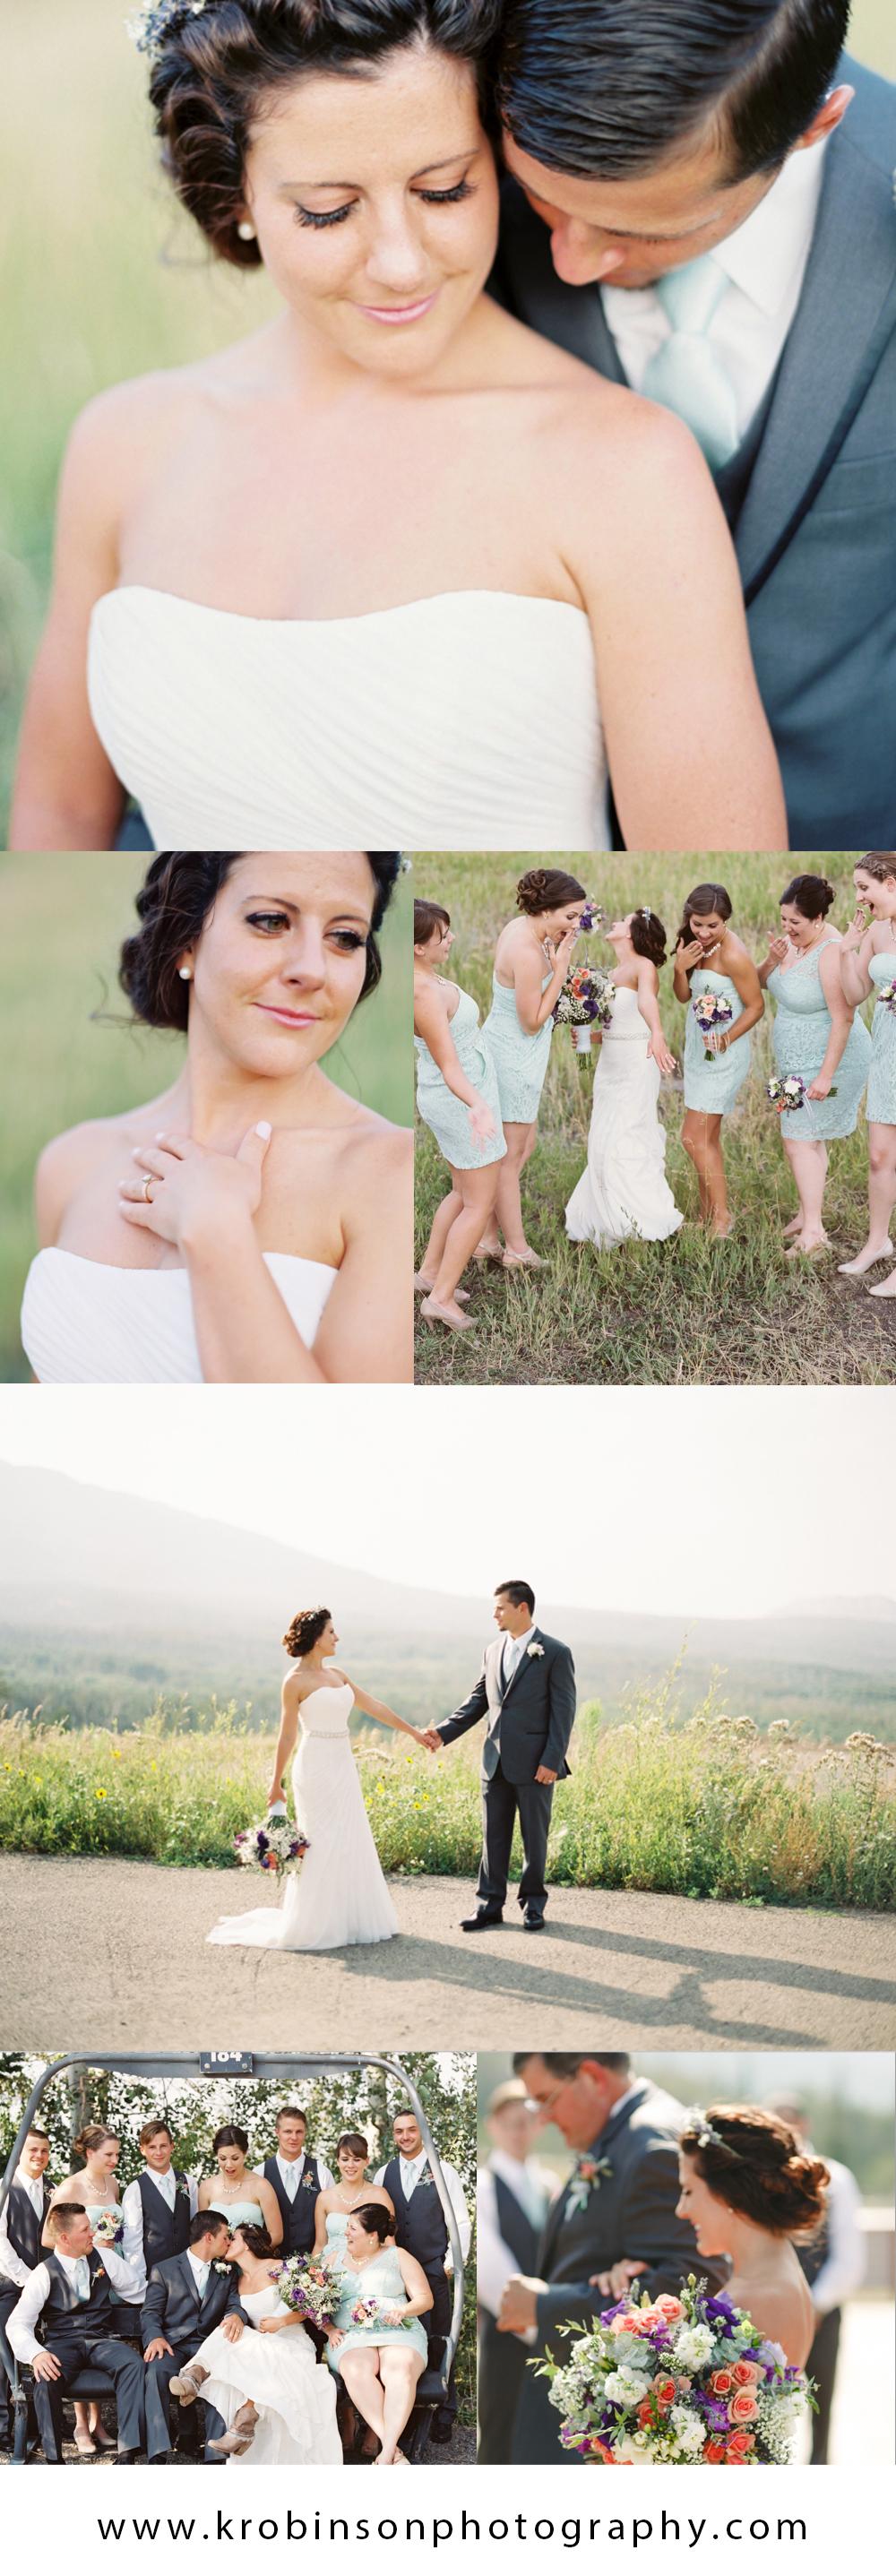 Venue - Powderhorn Mountain Resort, Florals - Flowers by Lorraine, Dress - David's Bridal, Lab - Photo Vision Prints, Groom - Men's Warehouse, Bridesmaids dresses - David's Bridal, MUAH - Tory Mangold, DJ - DJ Ryan Grizz, Coordinator, Morgan Barb